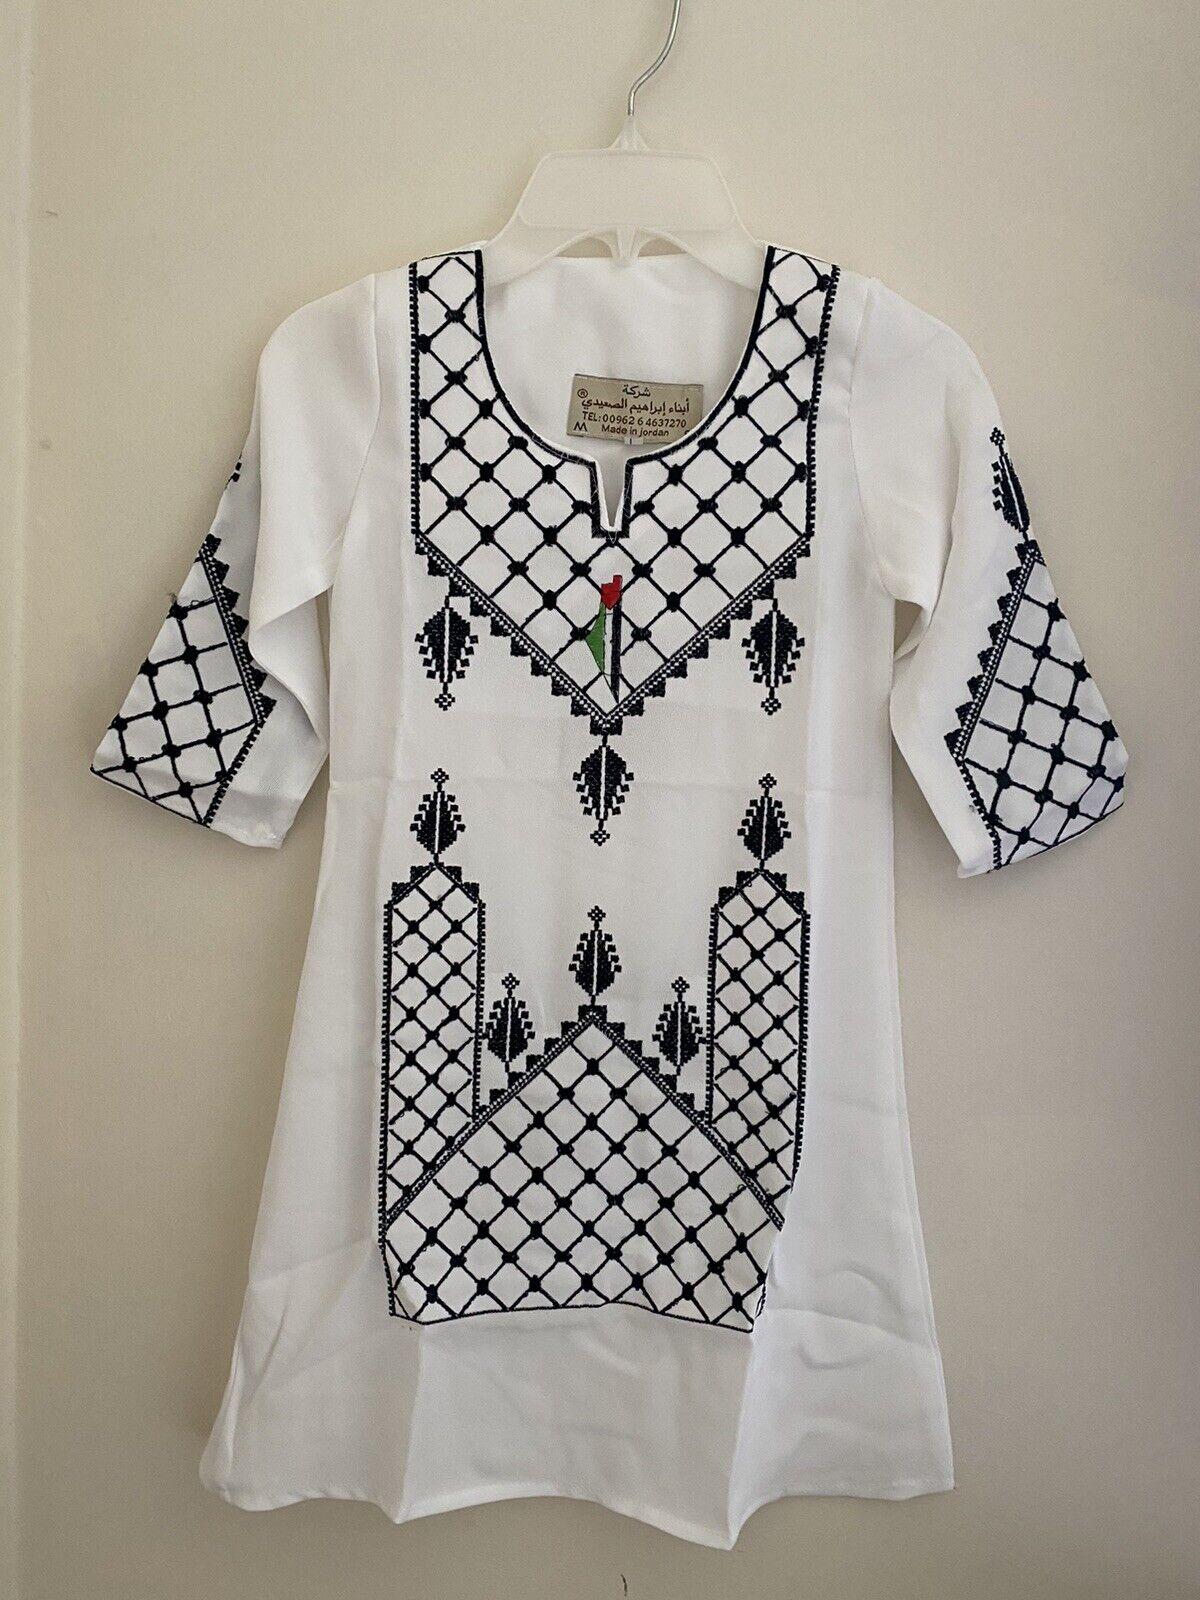 Kofia Dress Girl kids Traditional Dress Thob Abaya Palestine , 8-12 Years Old